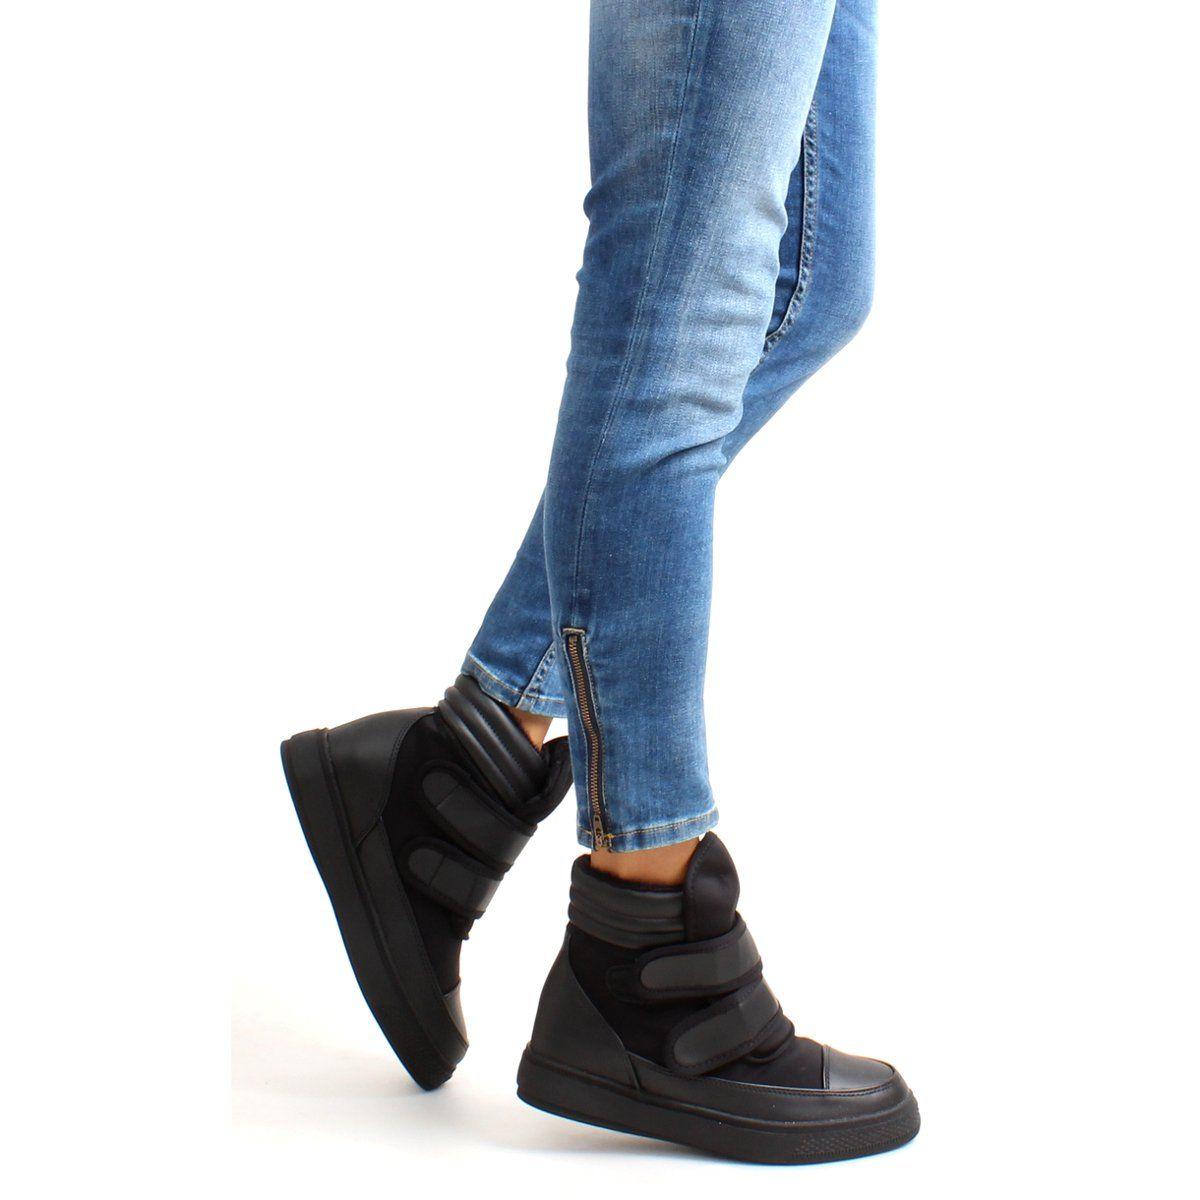 Sportowe Damskie Obuwiedamskie Czarne Ocieplane Sneakersy Z Paskami Gf Bk 4 Black Obuwie Damskie Fisherman Sandal Shoes Sneakers